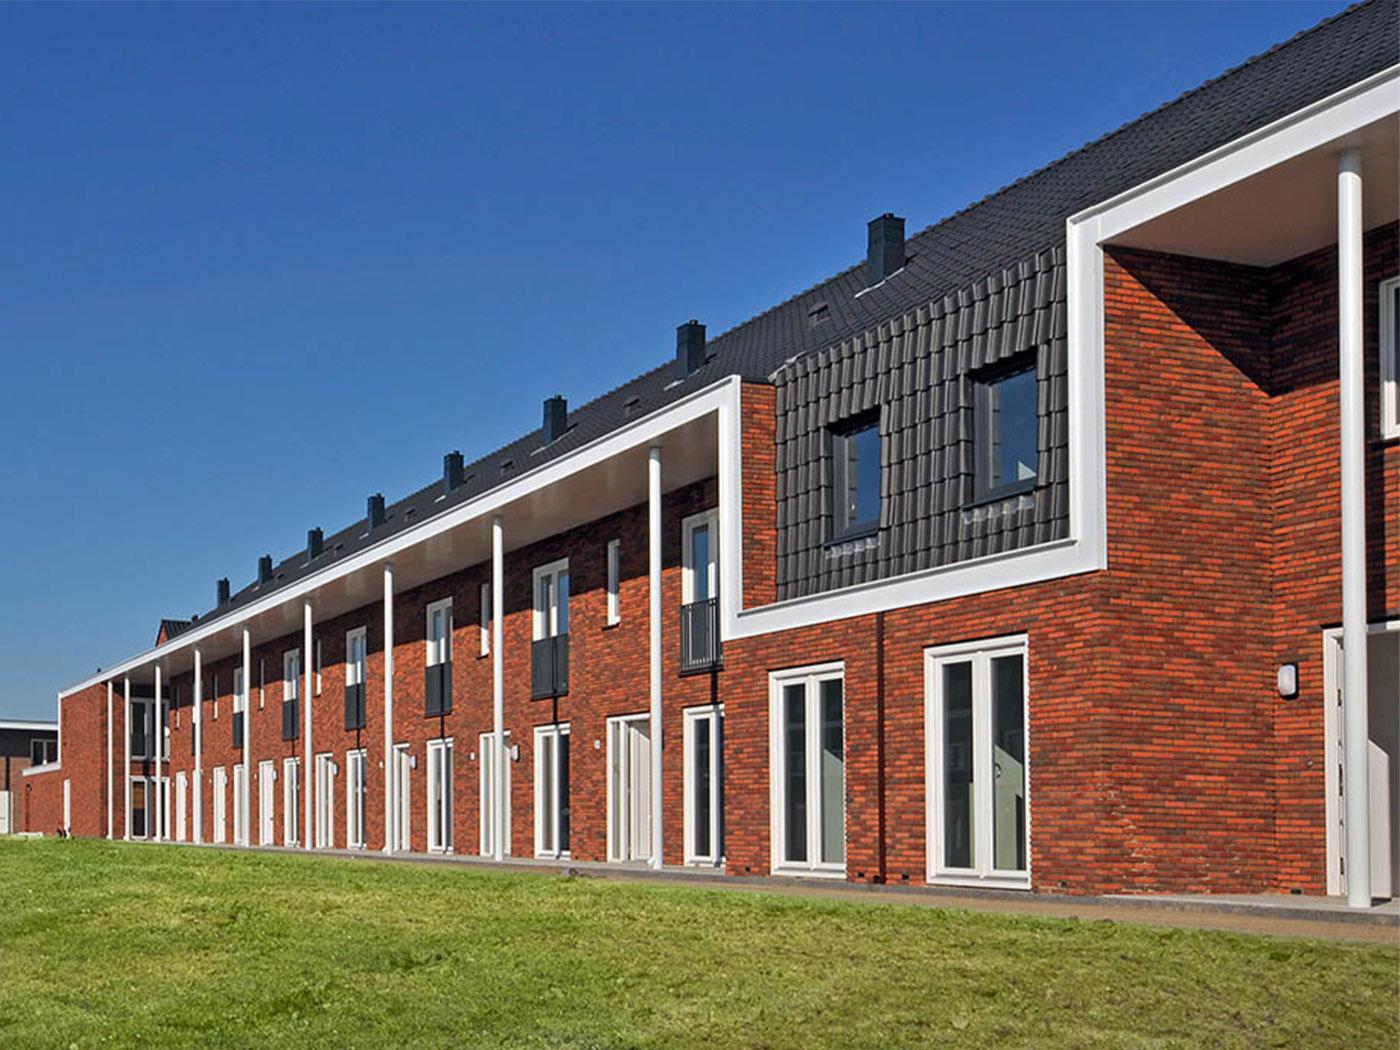 woningbouw architect de ontwerpdivisie